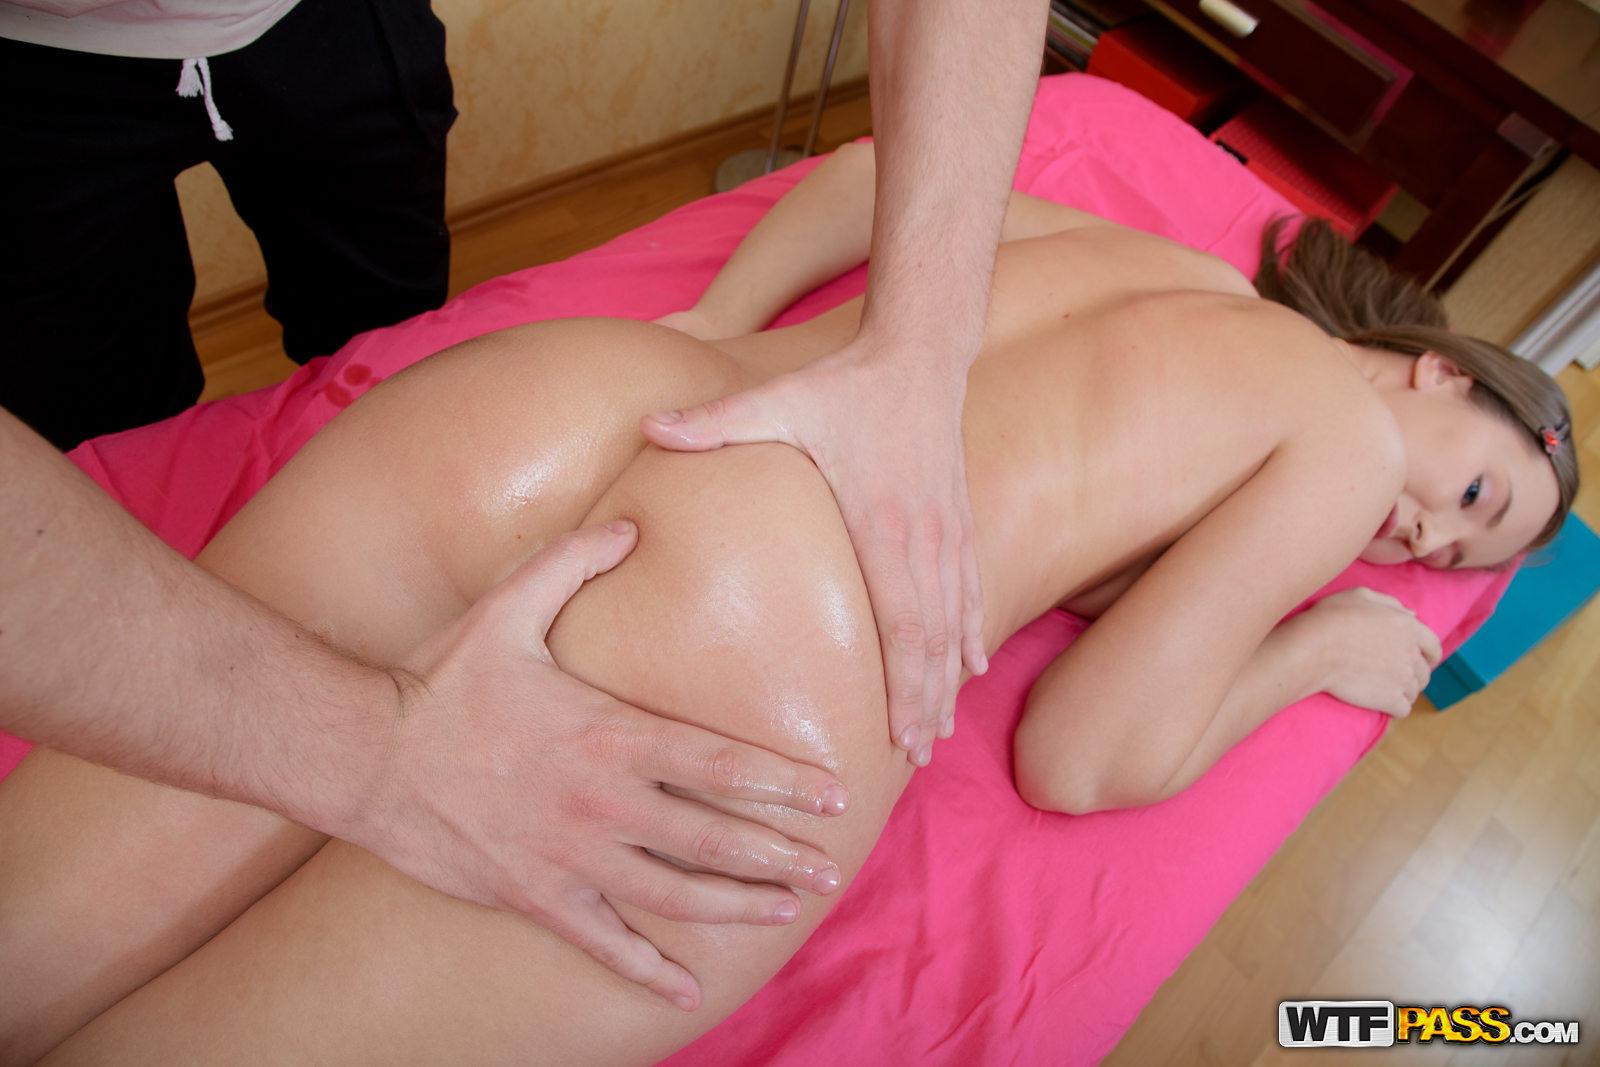 Mancy In Hdmassageporn Boob Massage Gets Her Horny February 02